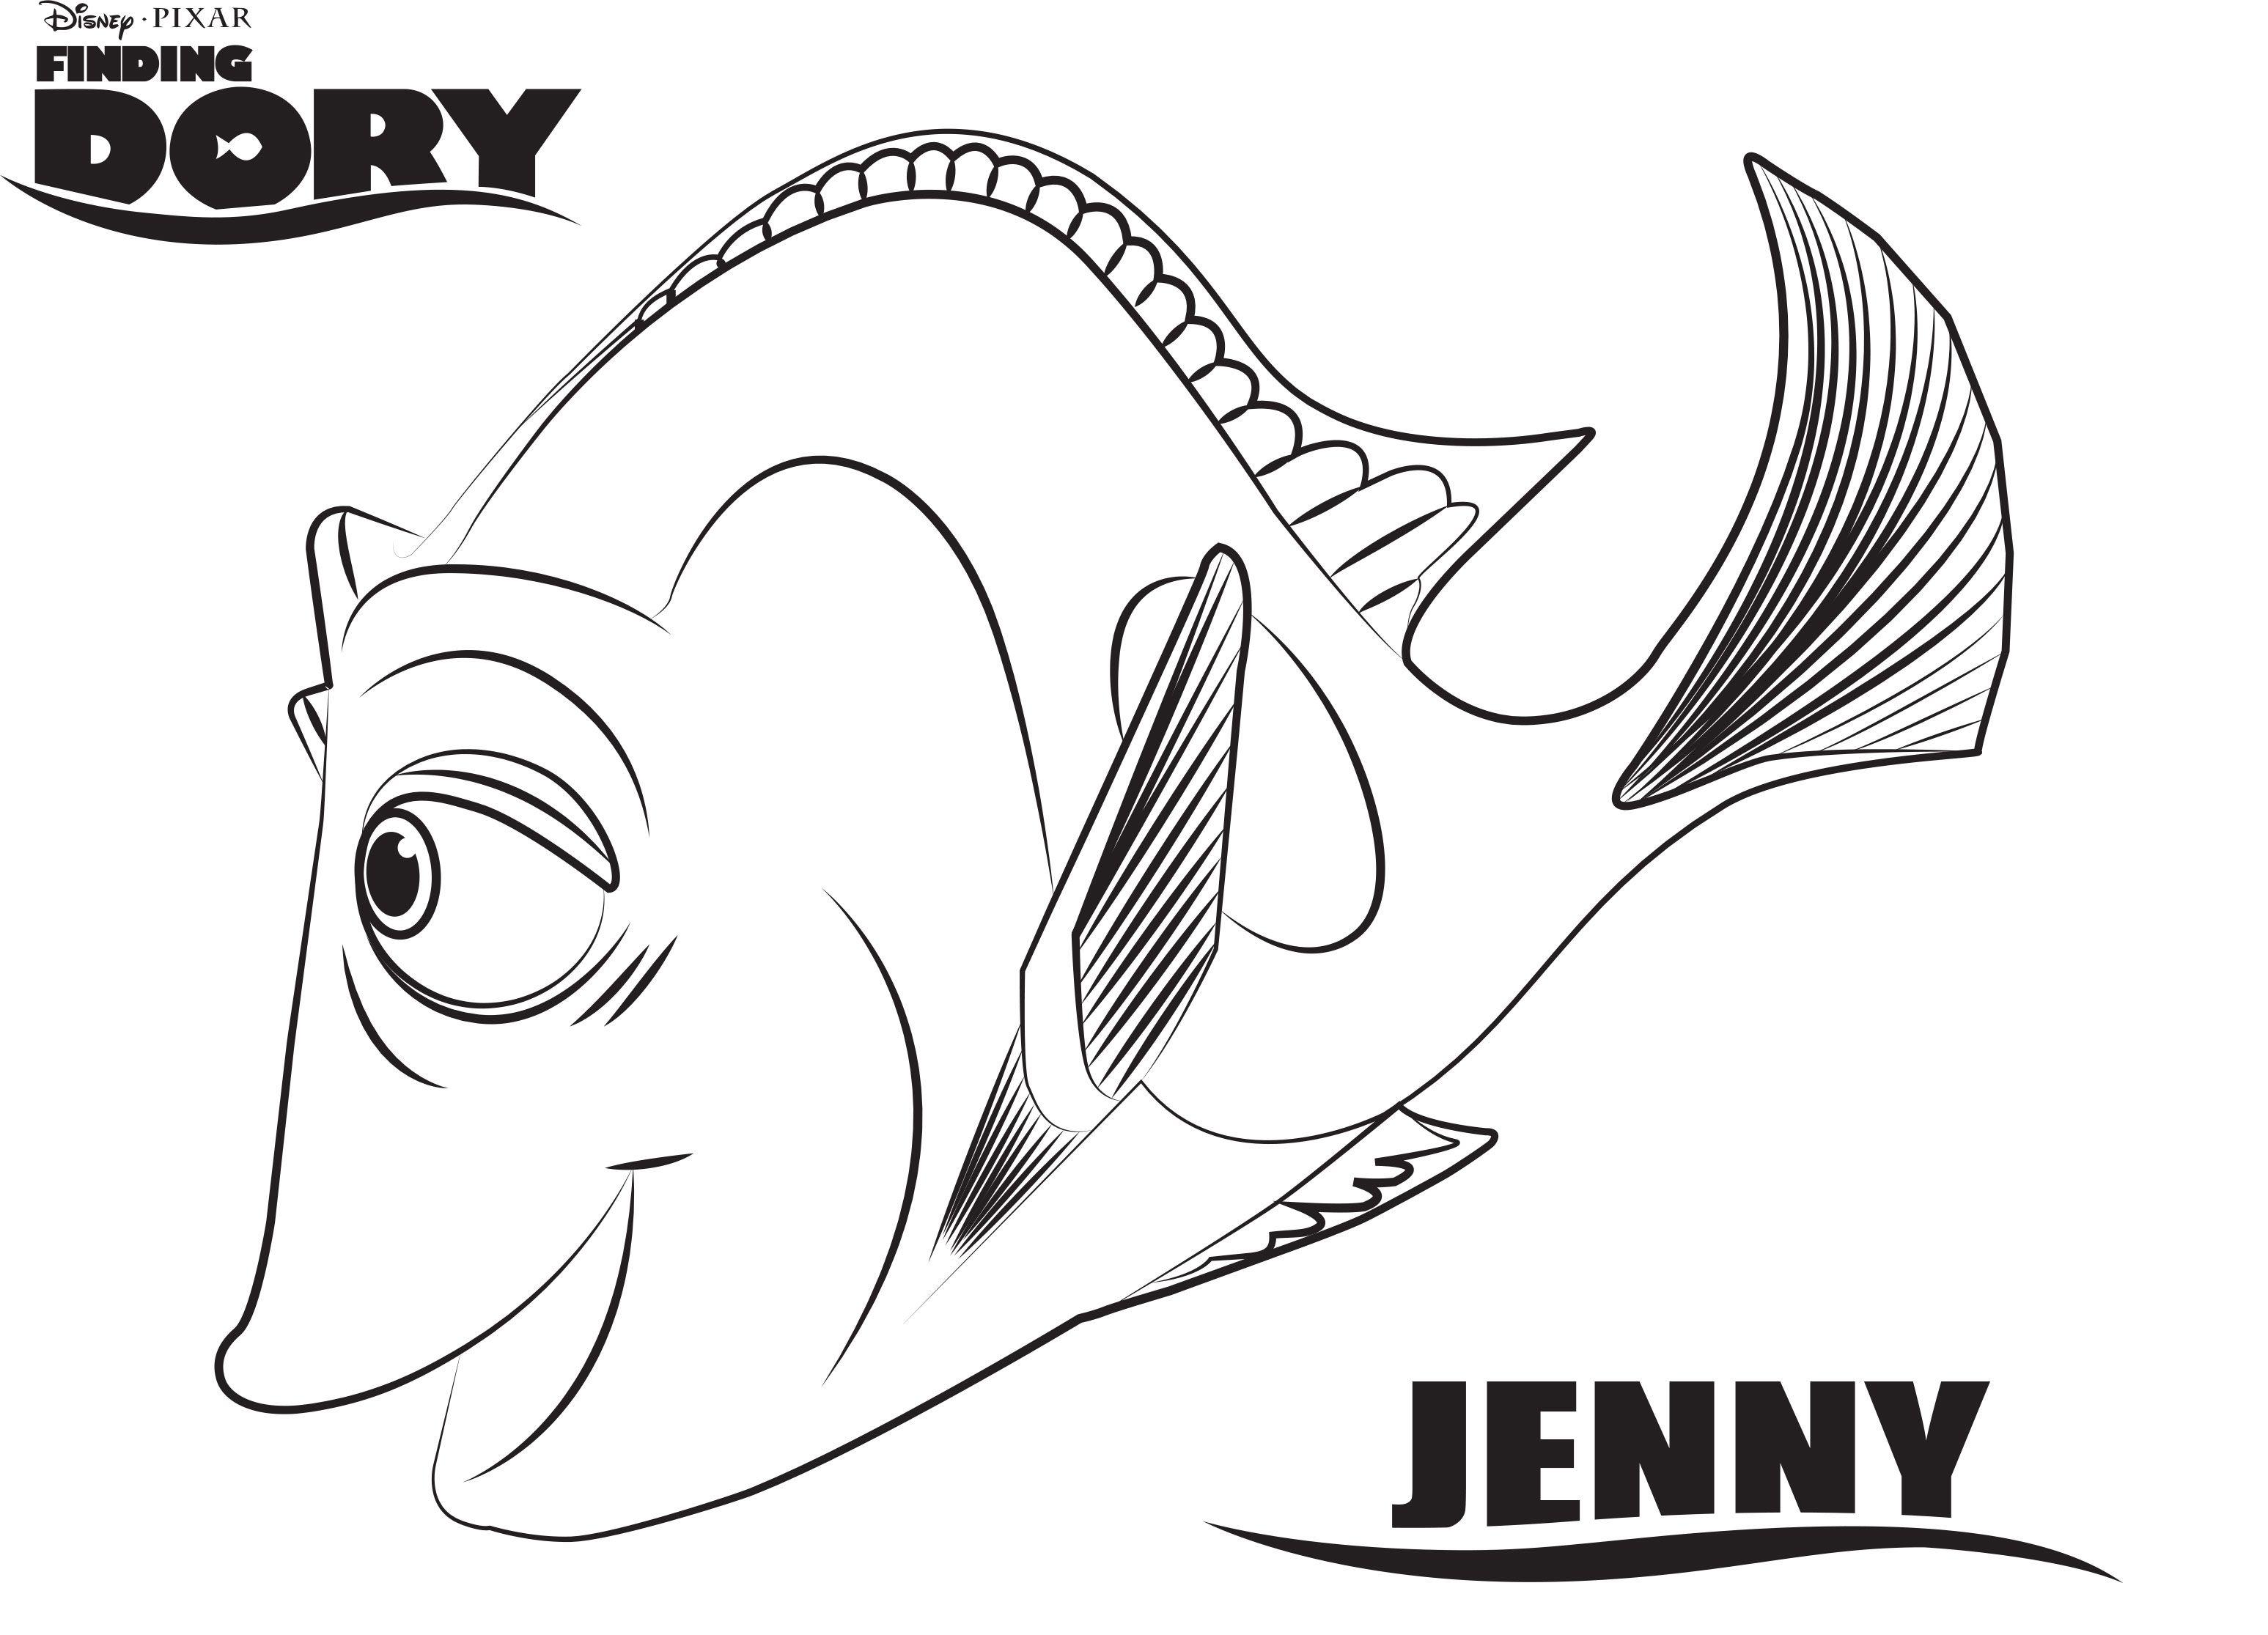 Finding Dory Kleurplaten Jenny Paginas Para Colorir Da Disney Paginas Para Colorir Desenhos